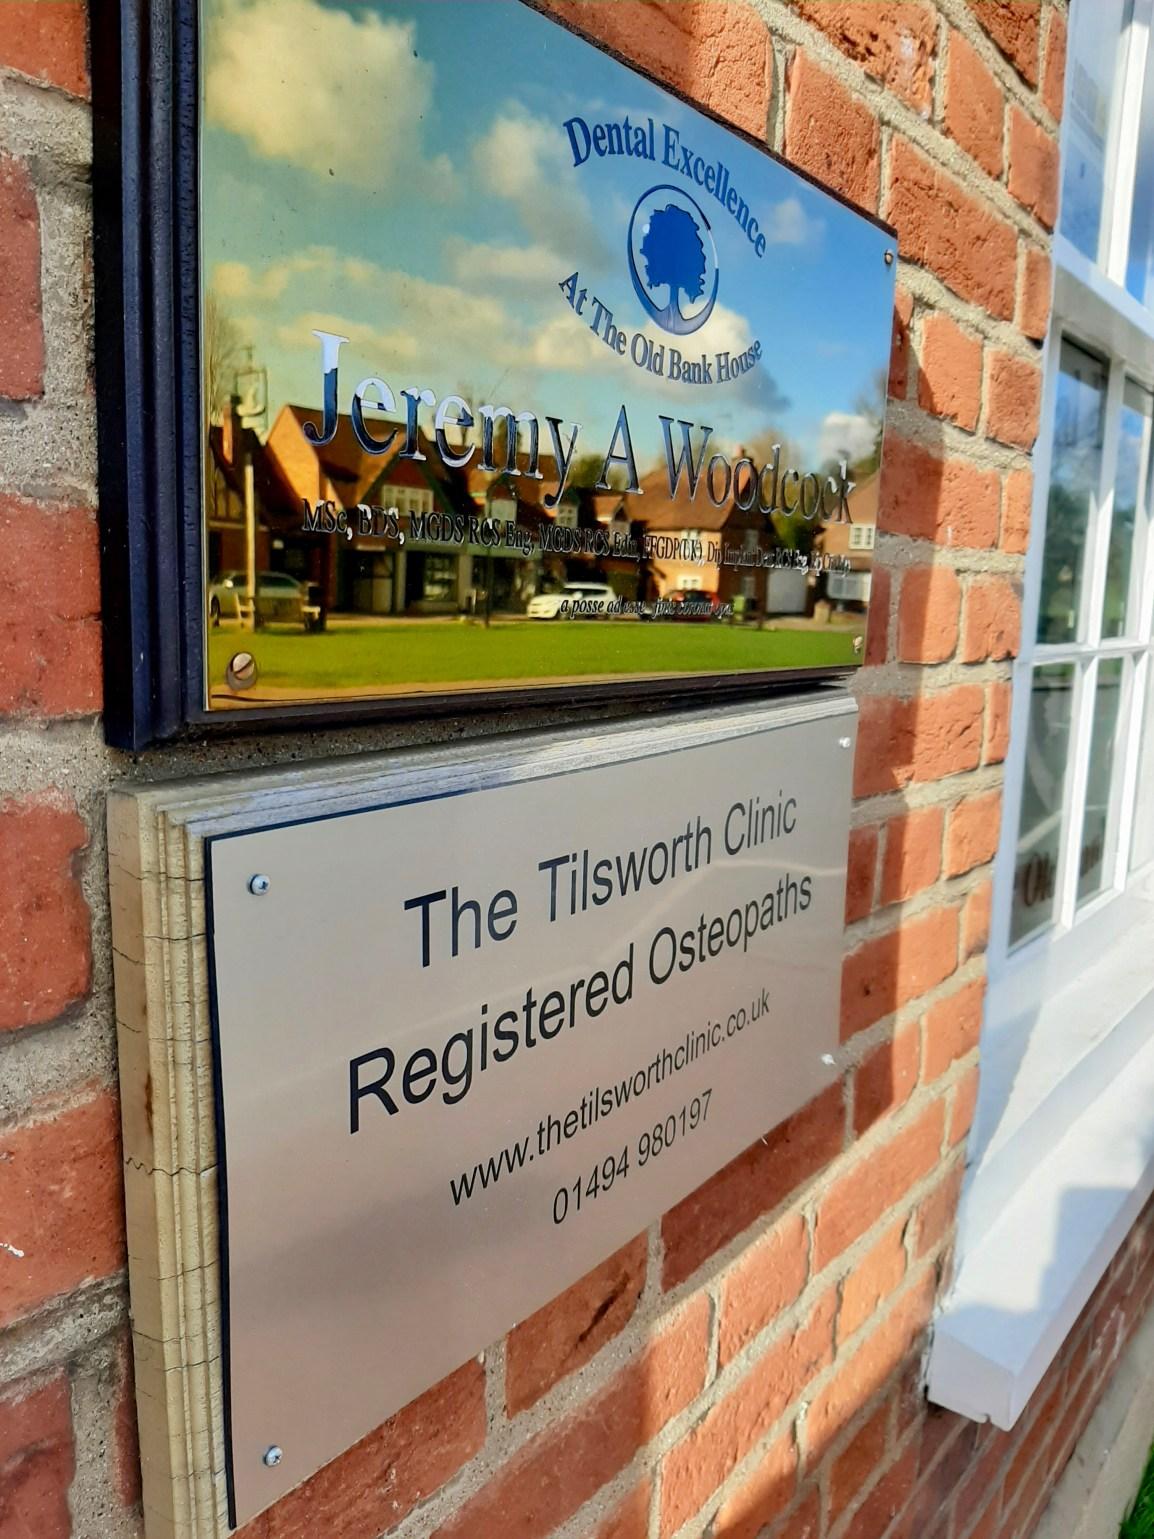 The Tilsworth Clinic